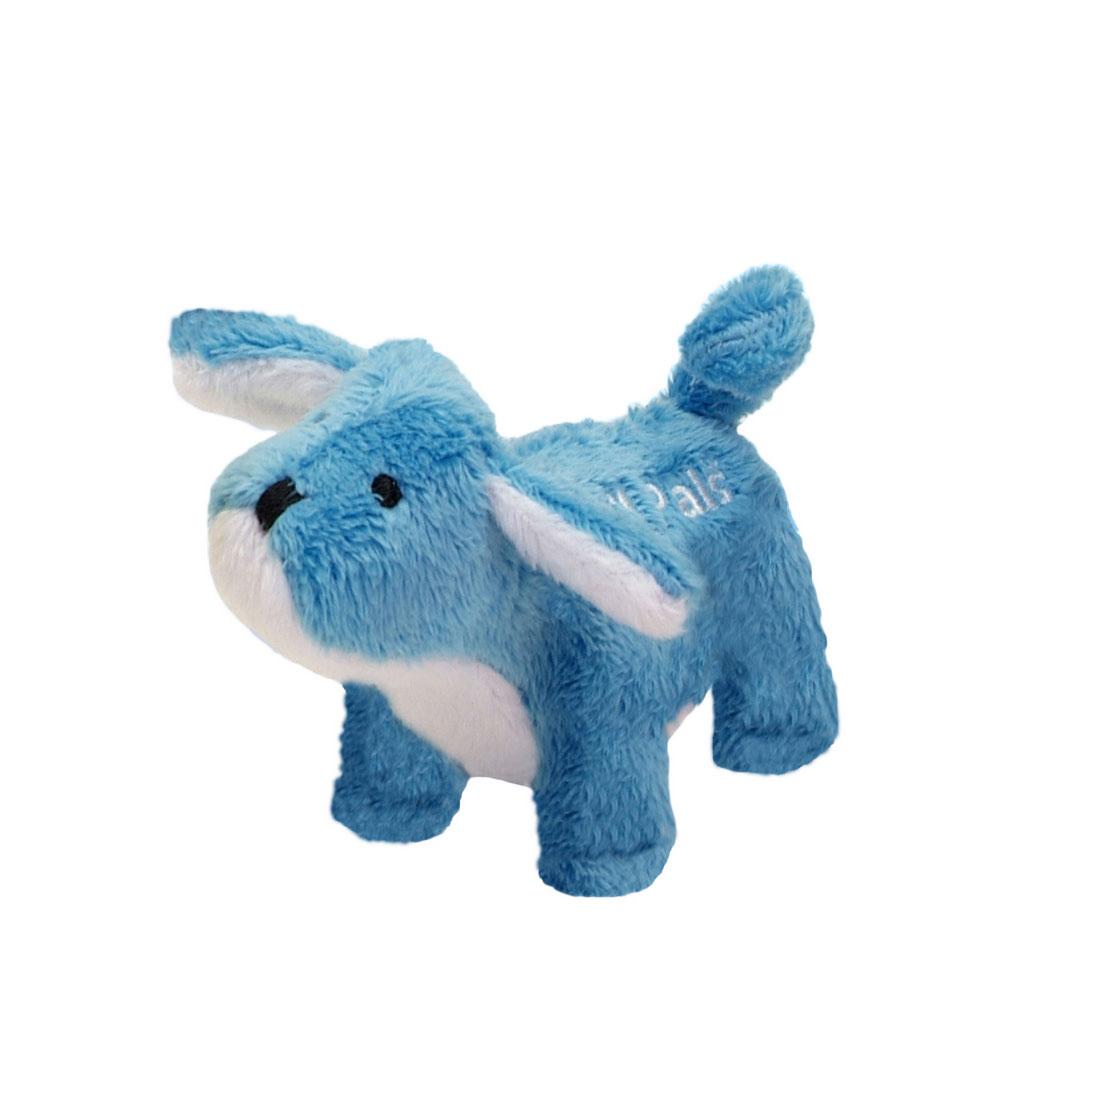 Li'l Pals Dog Plush Dog Toy, 4.5-in